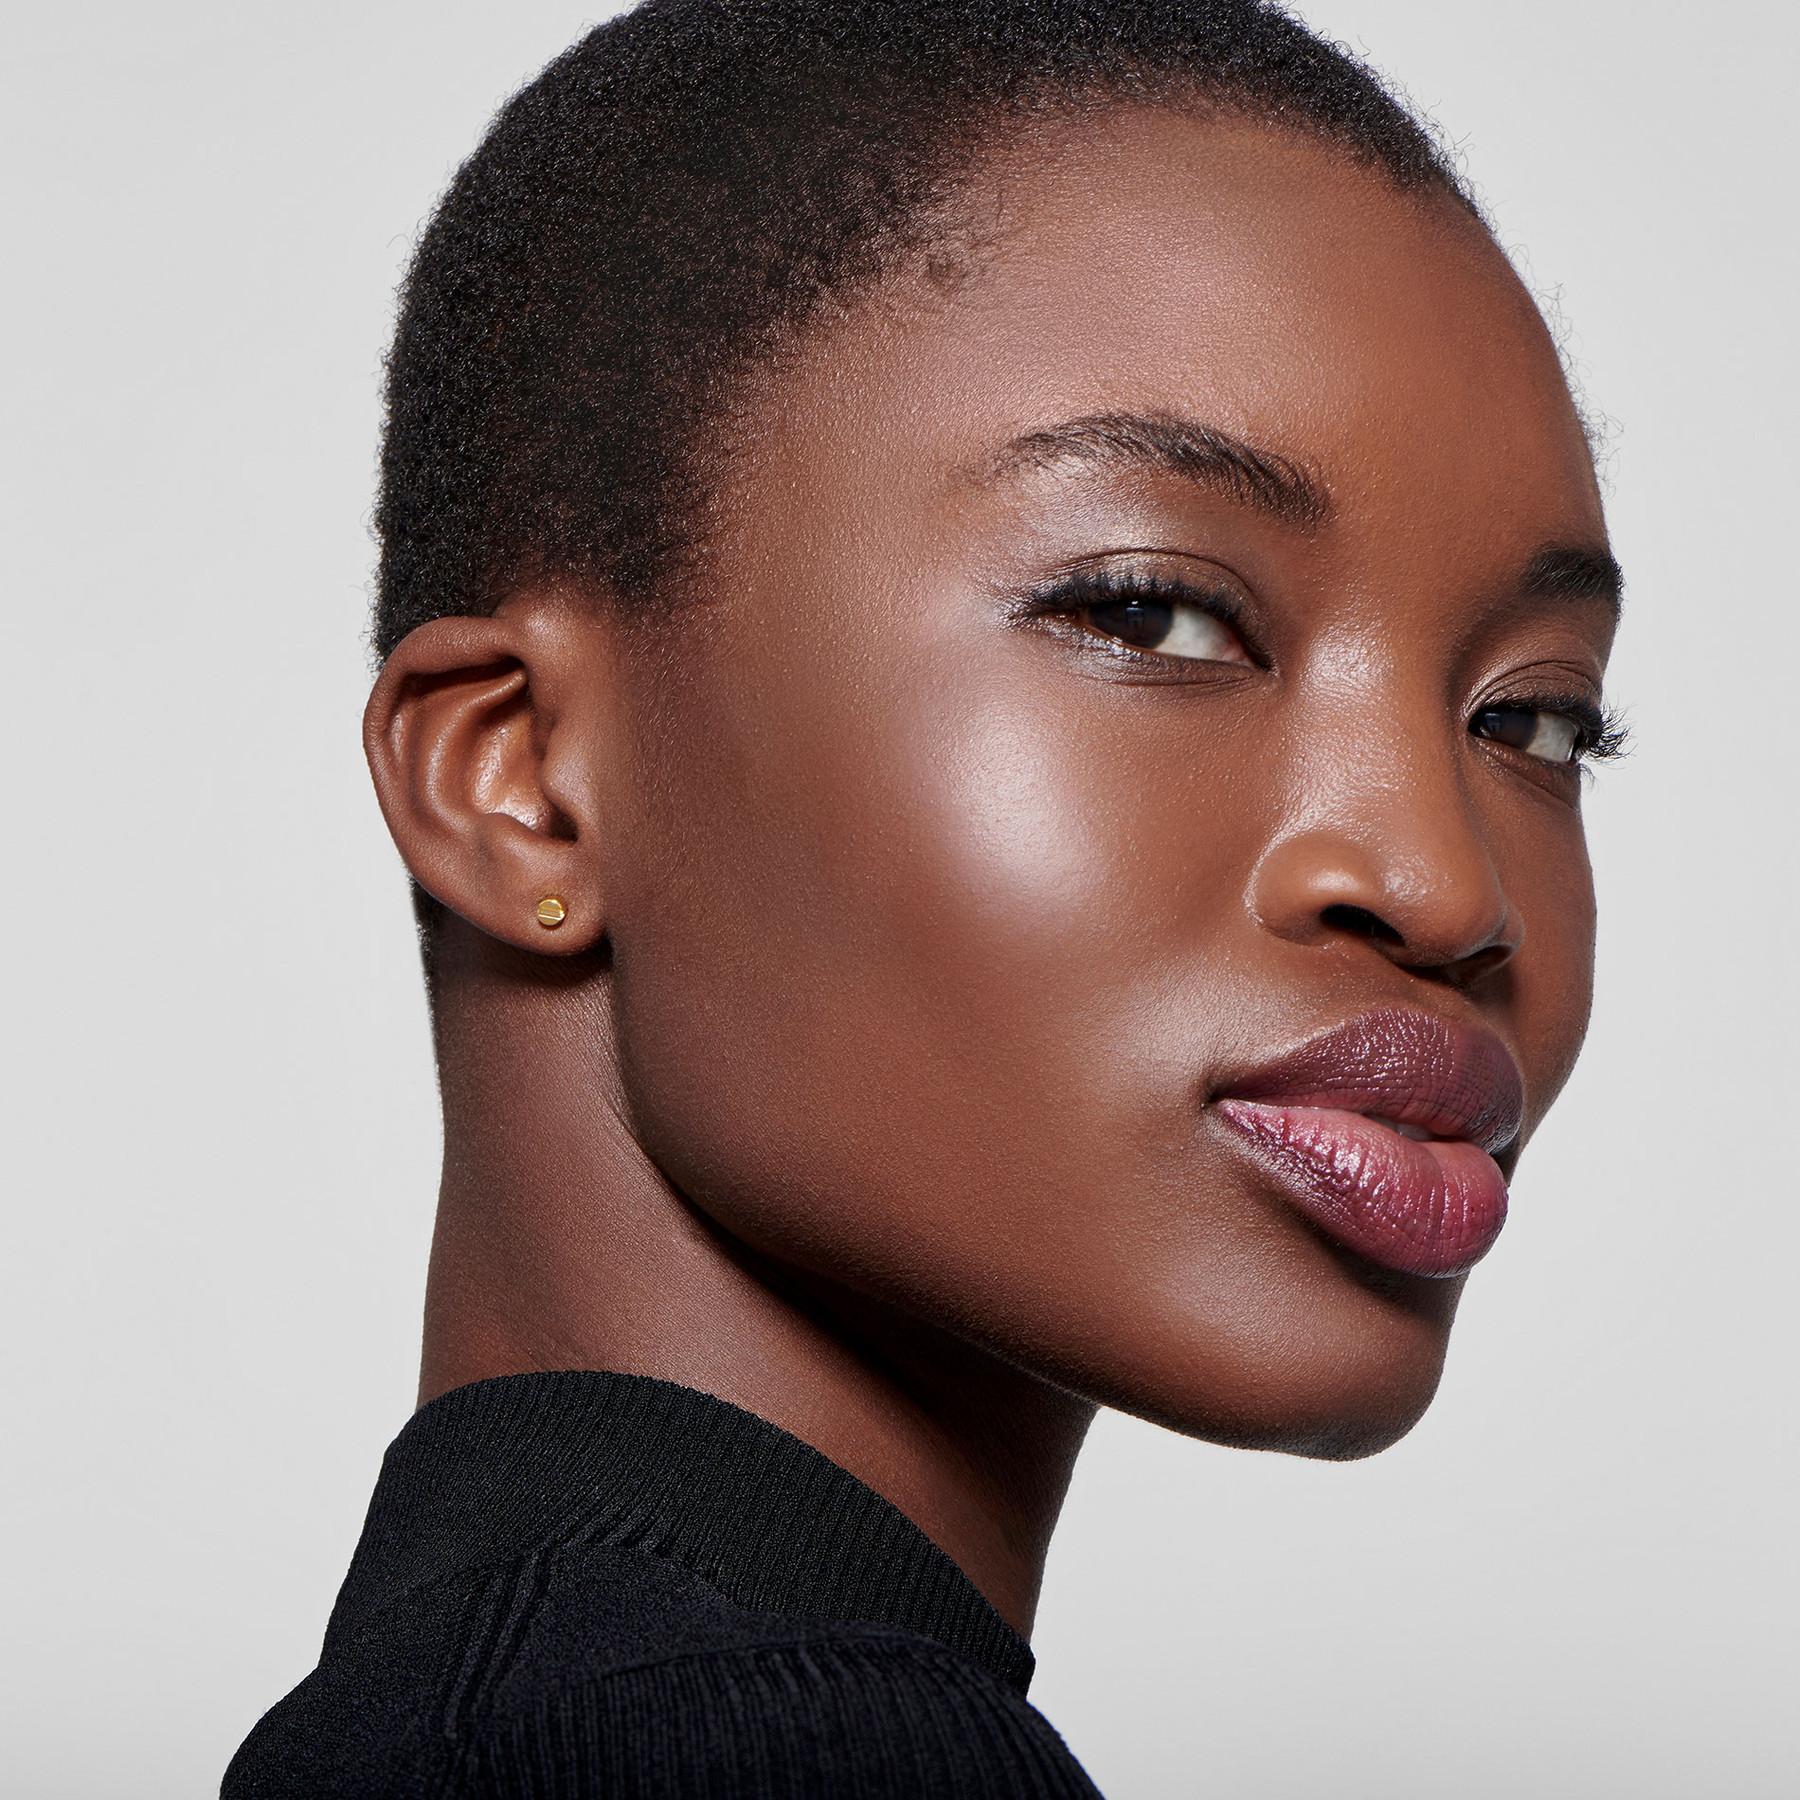 22 karat gold stud earrings on attractive black female model